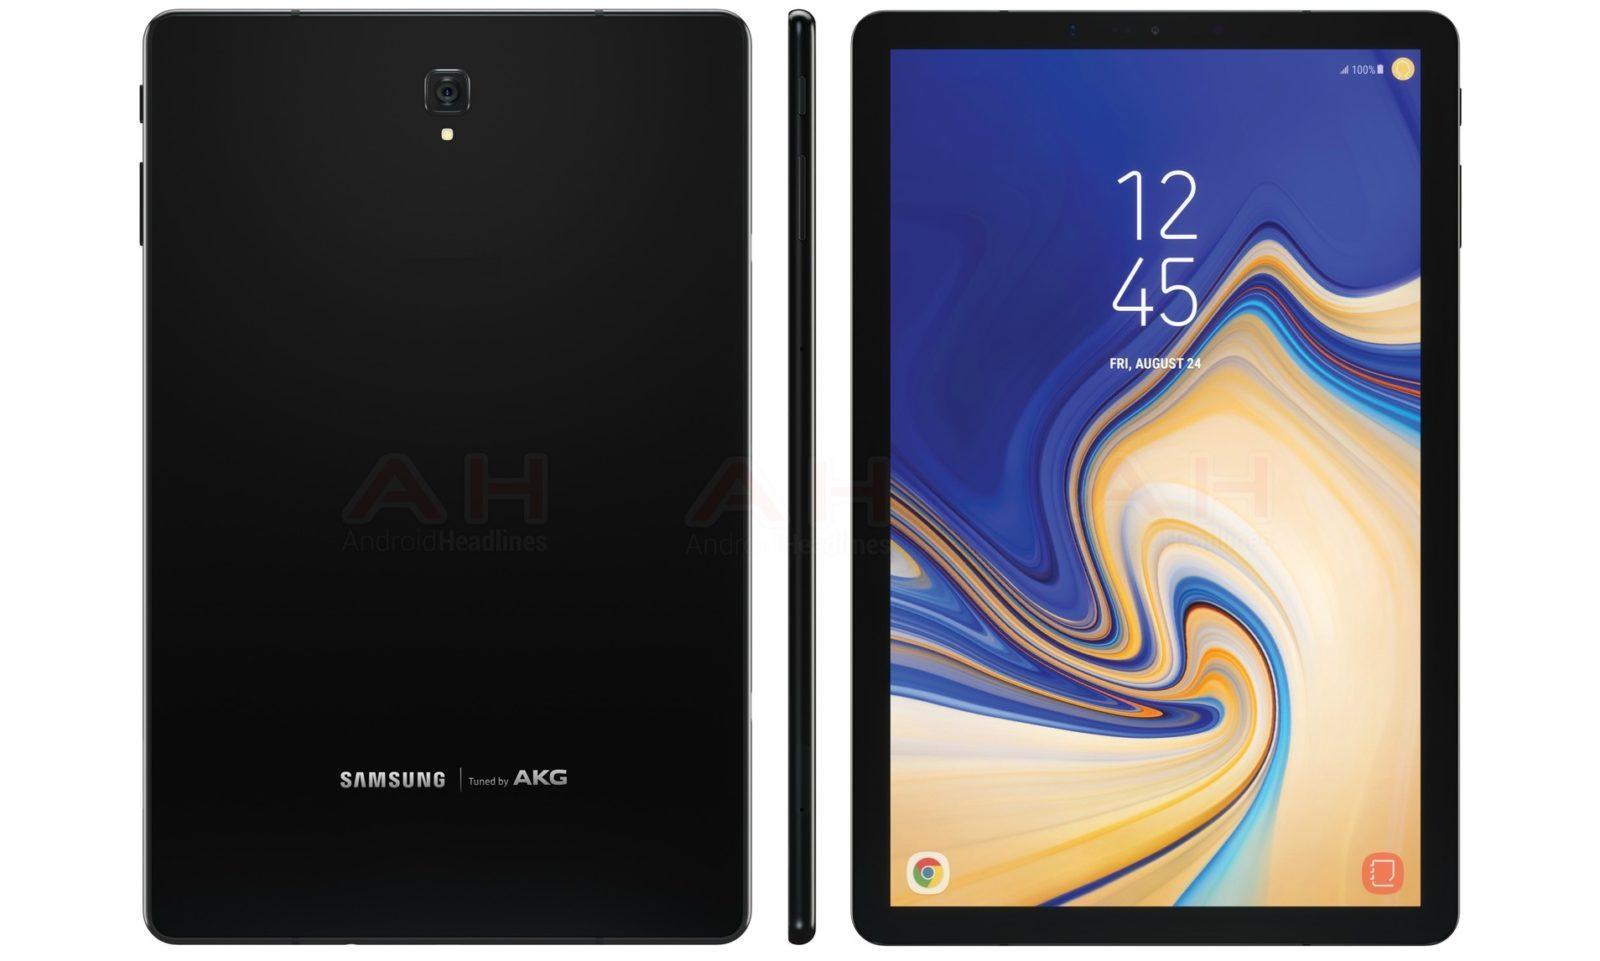 Tablet Tab Samsung Terbaru Galaxy 3v T116 8gb Garansi Resmi 1 Tahun S4 105 Lte 256gb